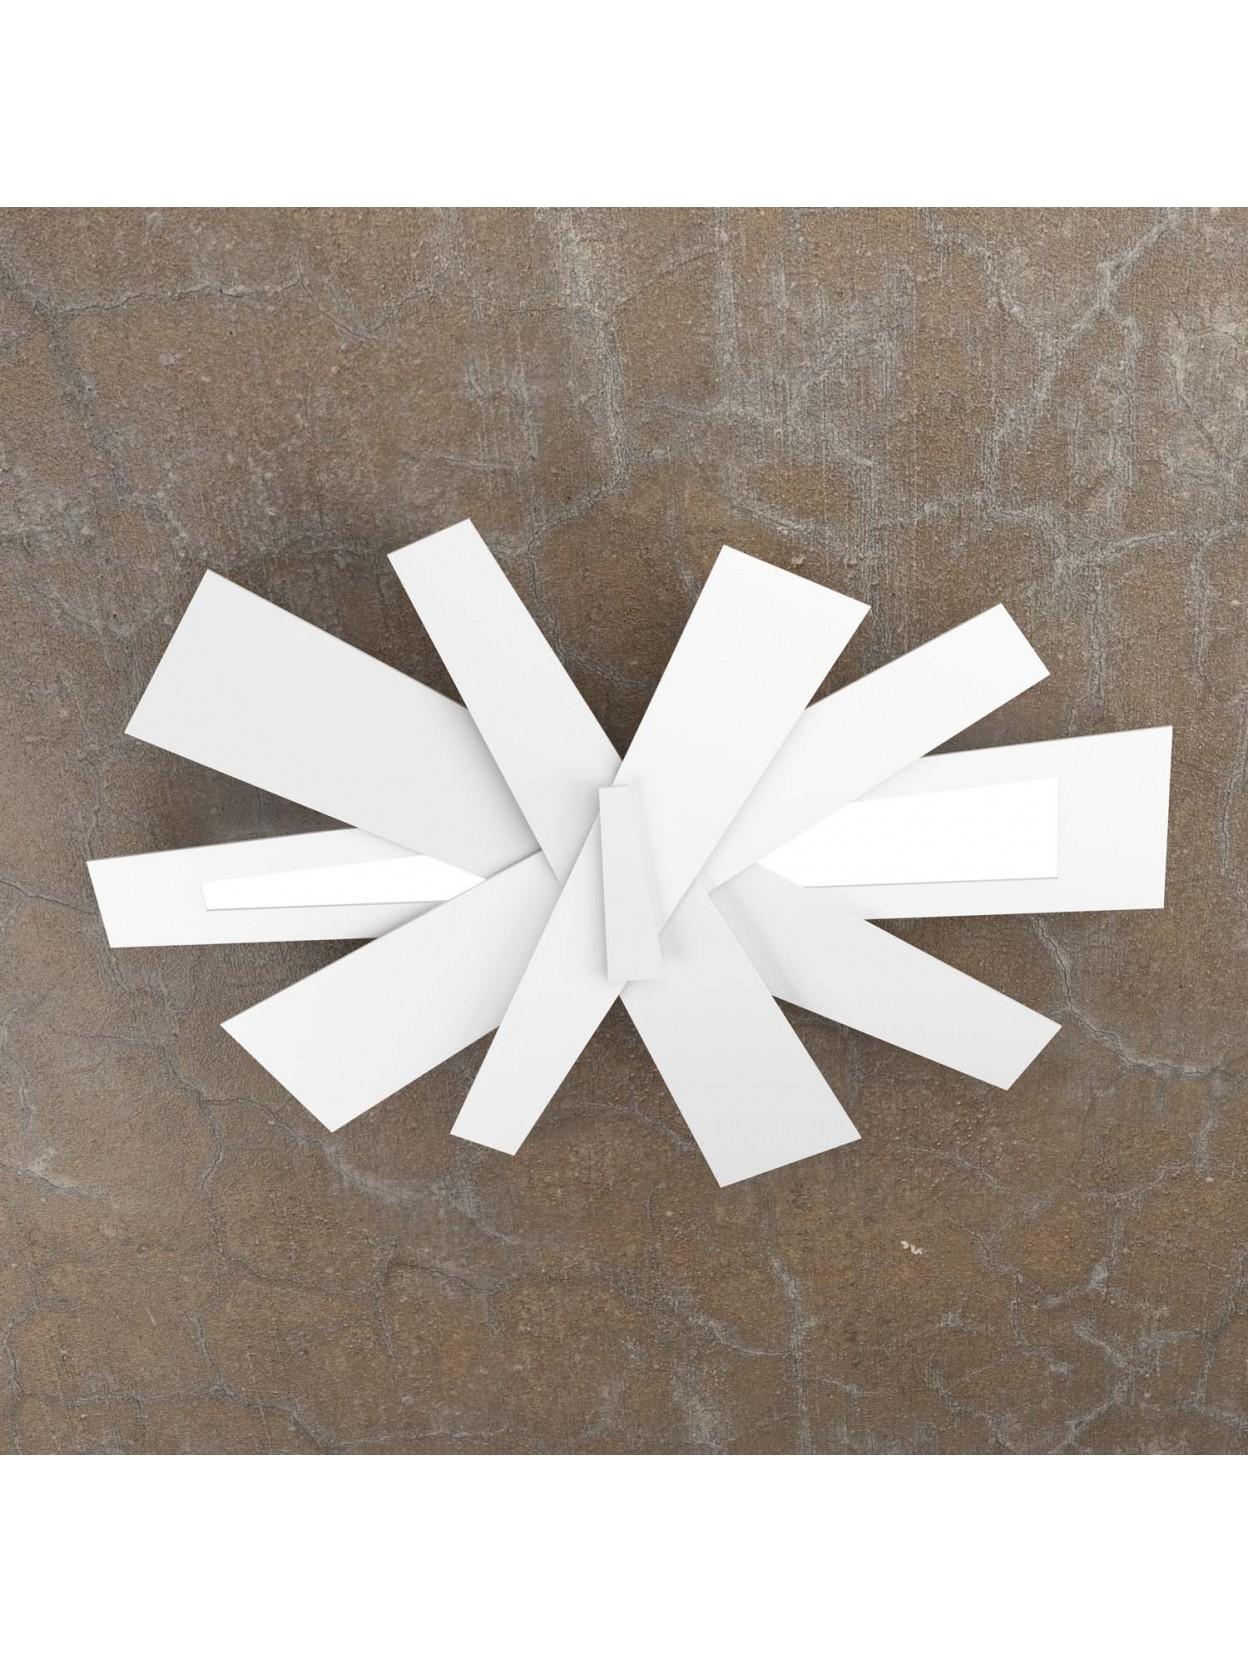 Plafoniera moderna design 2 luci tpl 1139 65 bianco for Plafoniera moderna